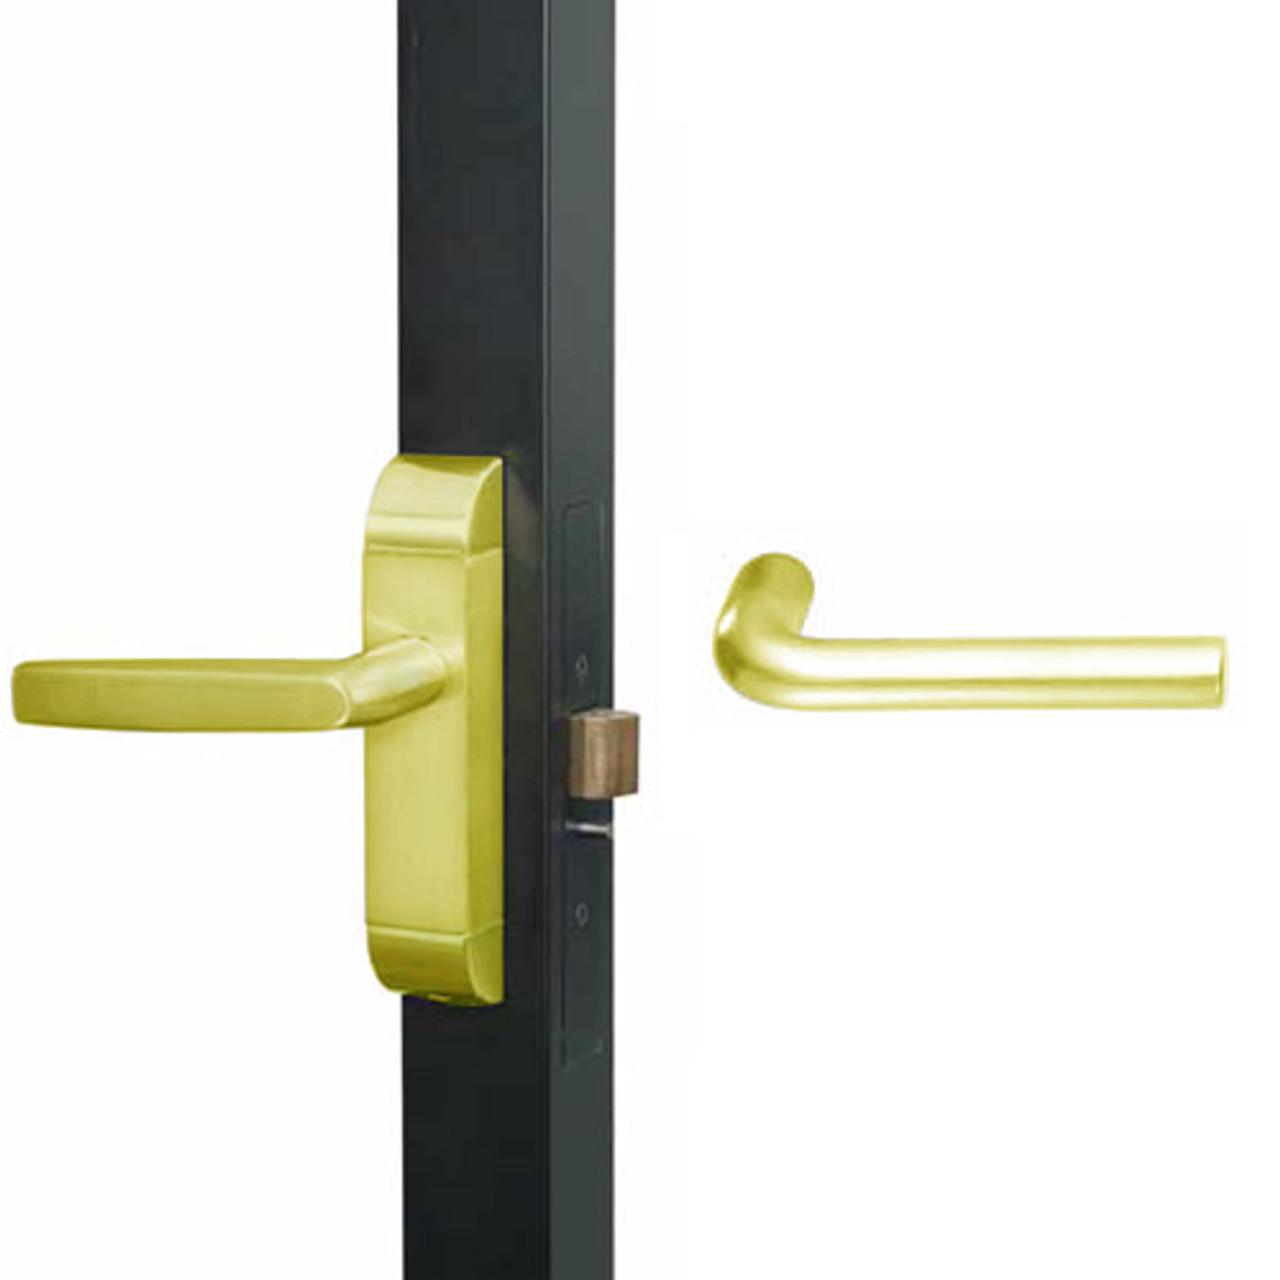 4600M-ME-632-US3 Adams Rite ME Designer Deadlatch handle in Bright Brass Finish